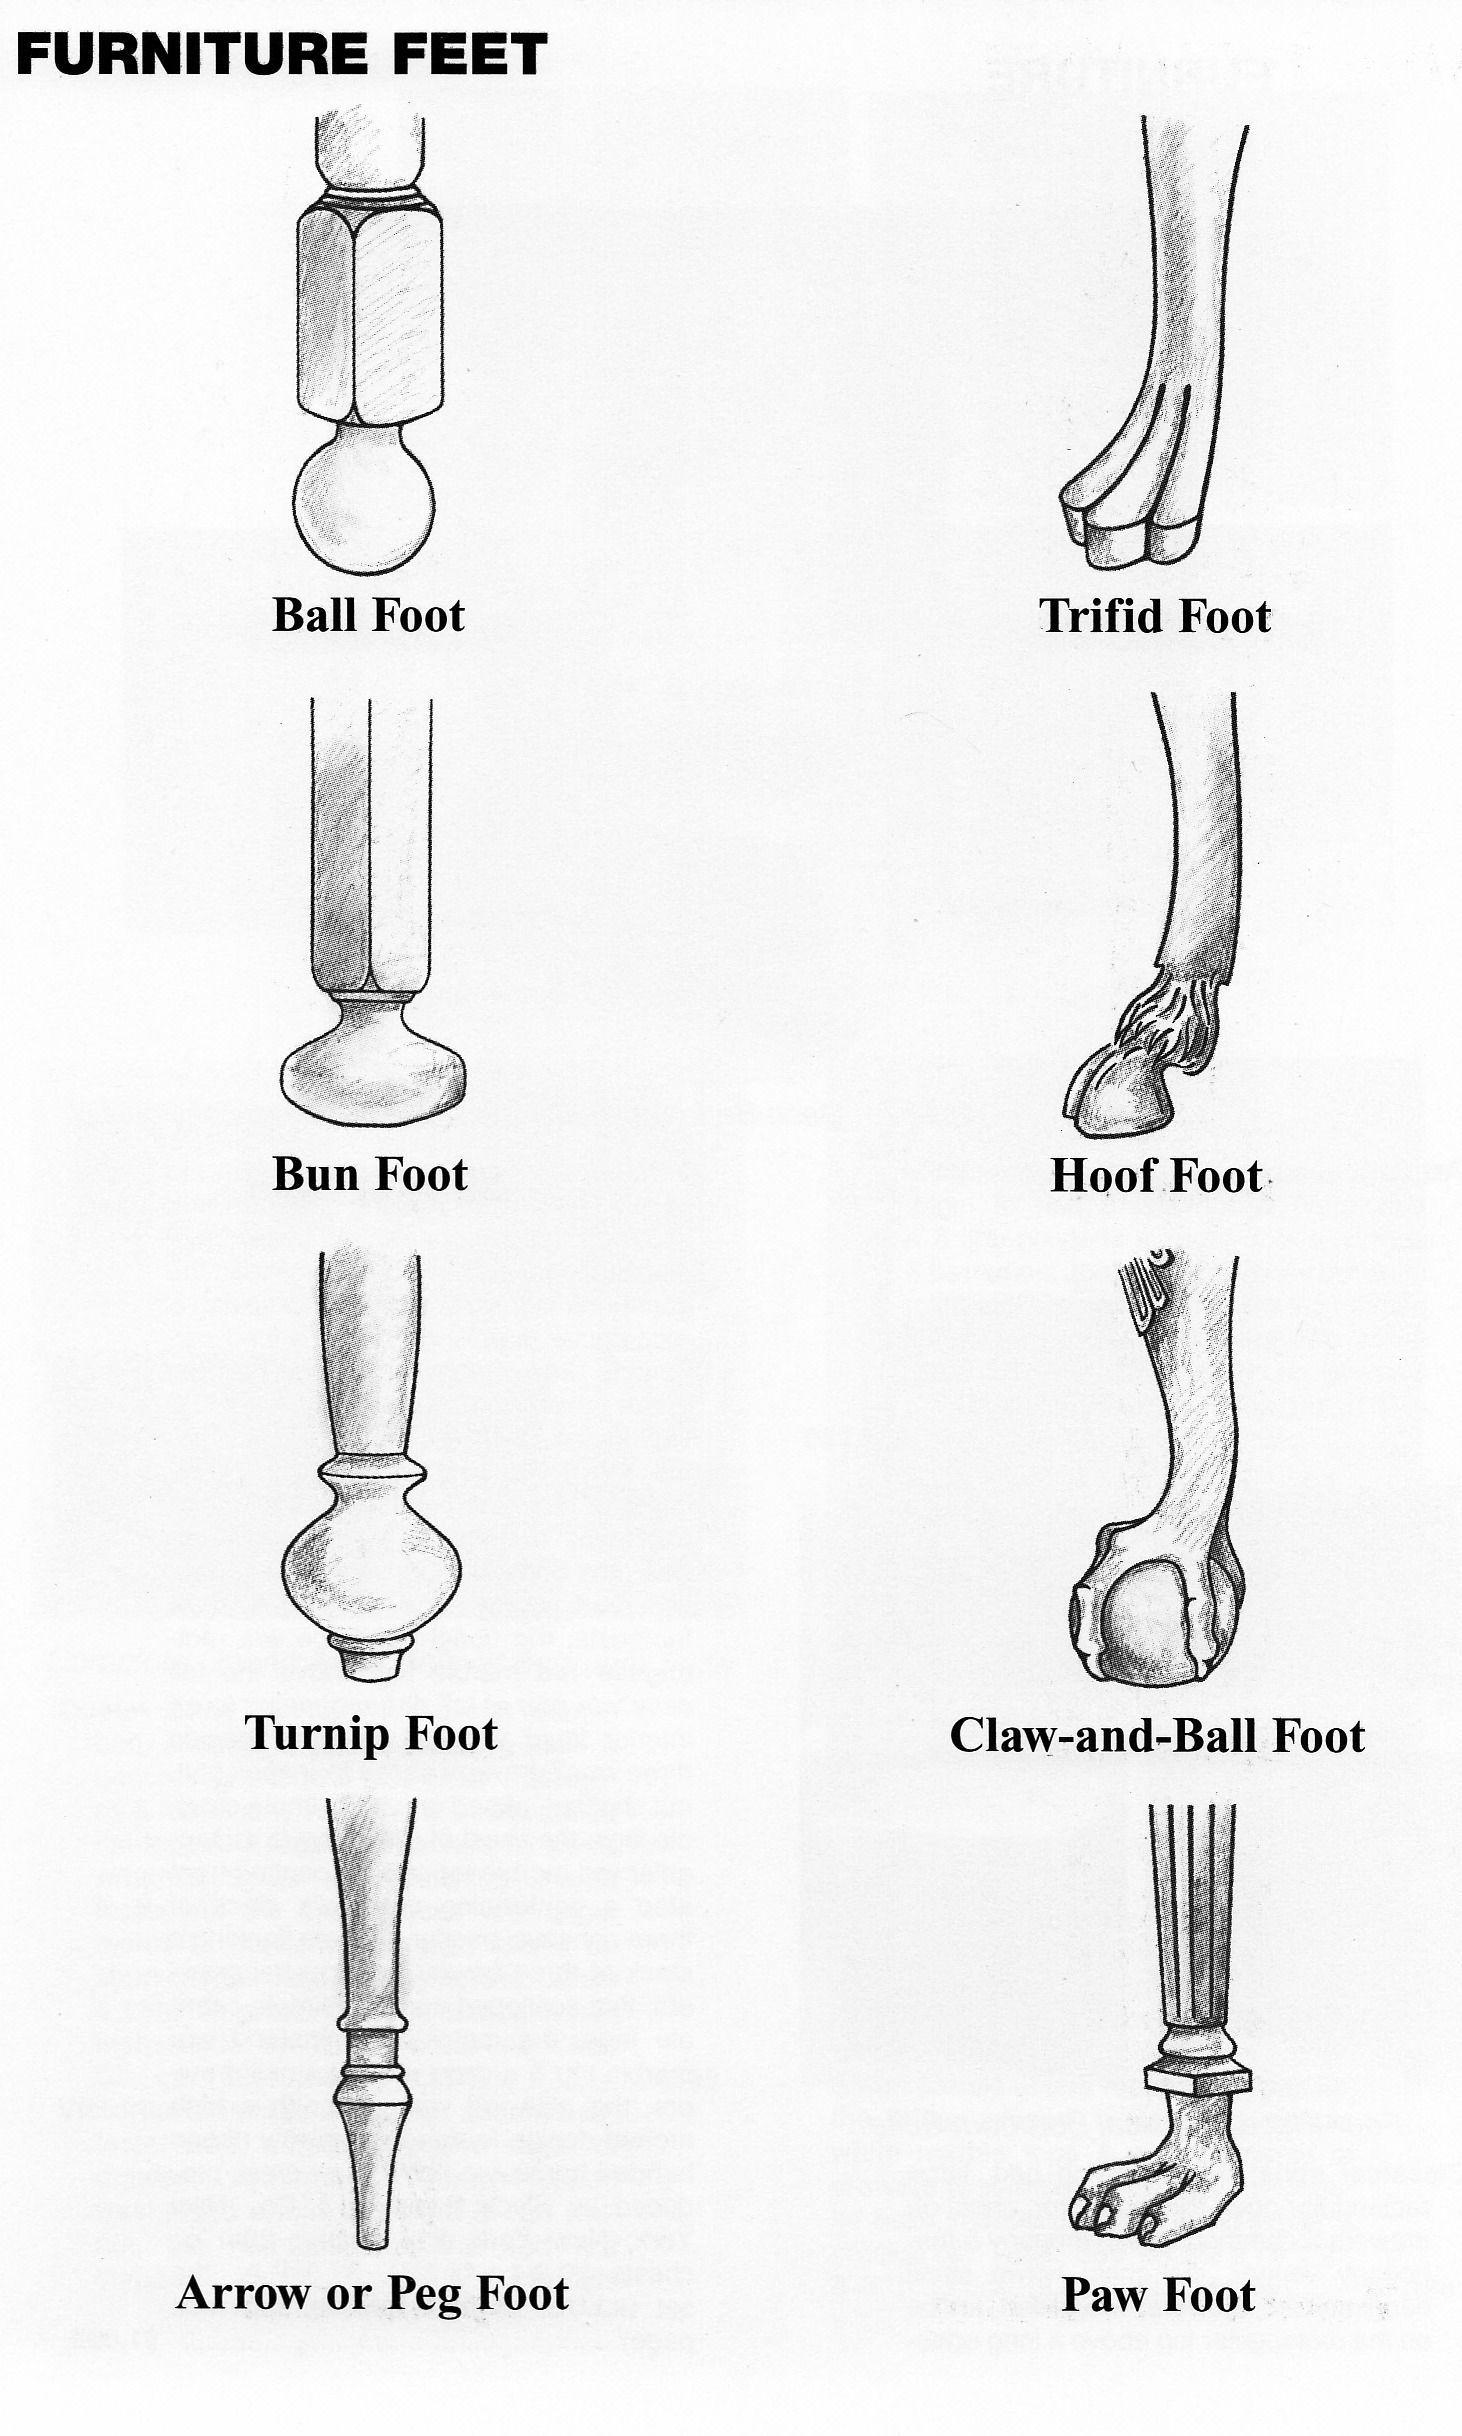 Diagrams Of Furniture Feet Furniturediagram